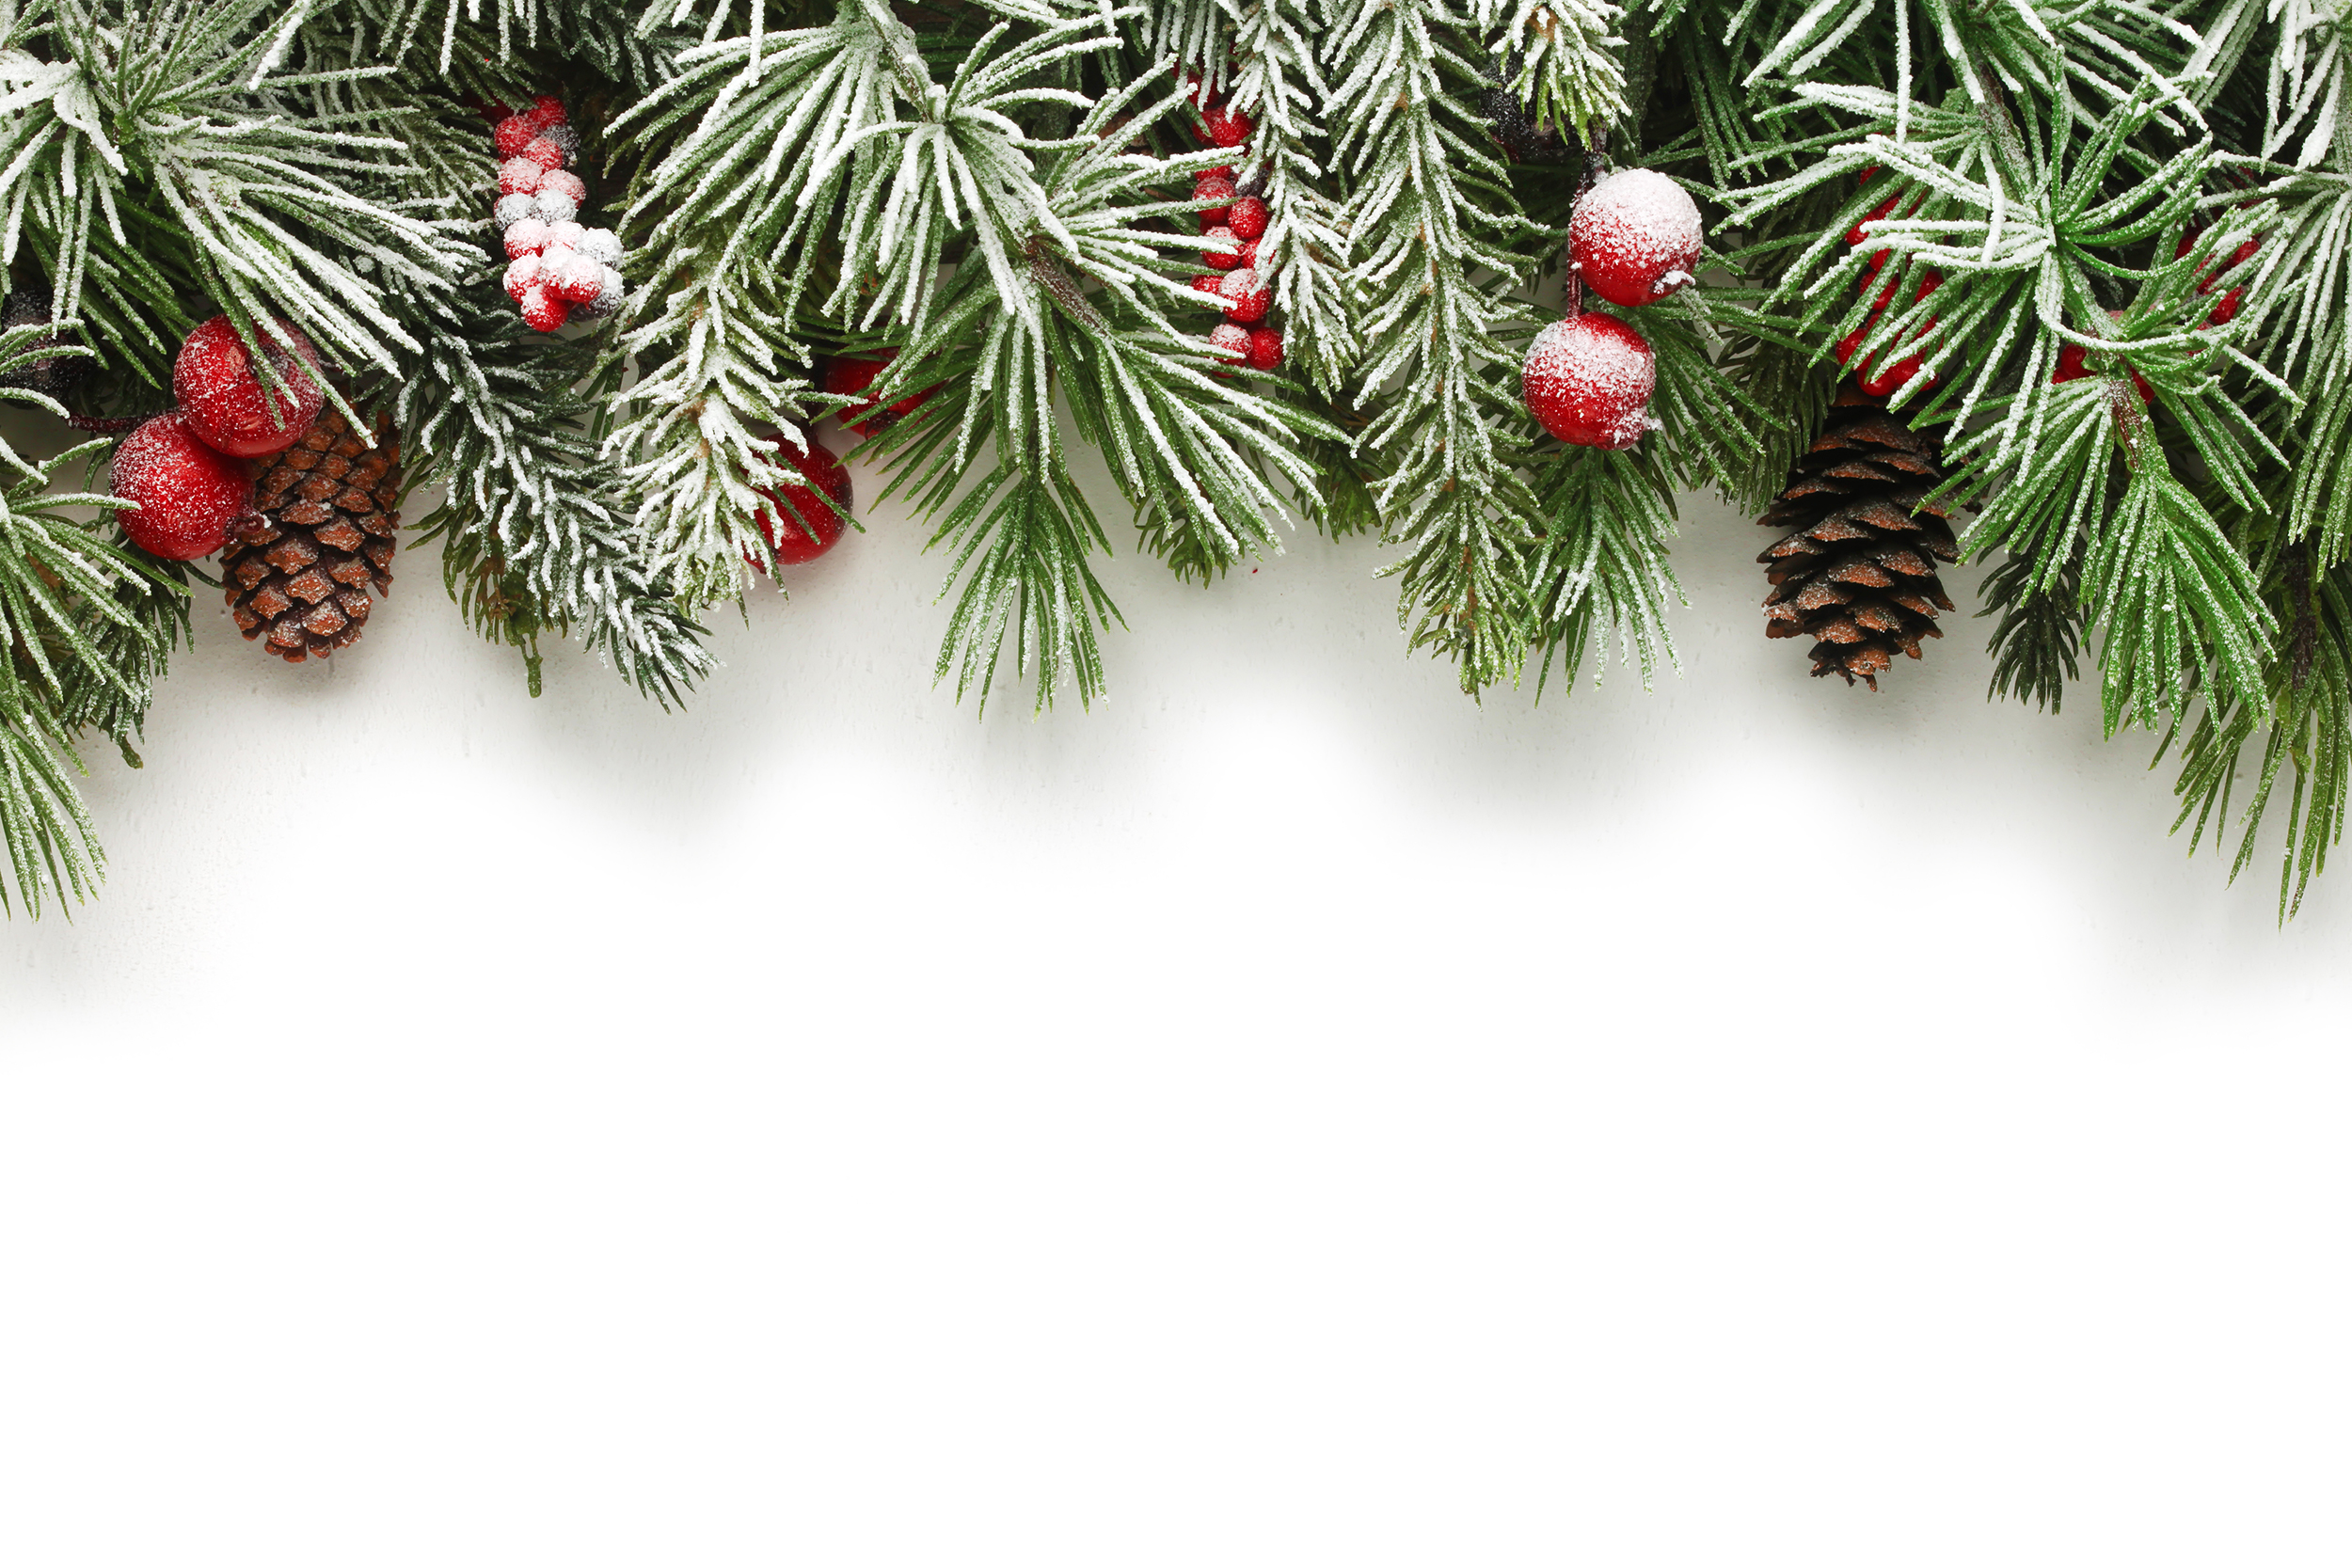 Christmas Background - Elizabethan Catering Services Ltd.